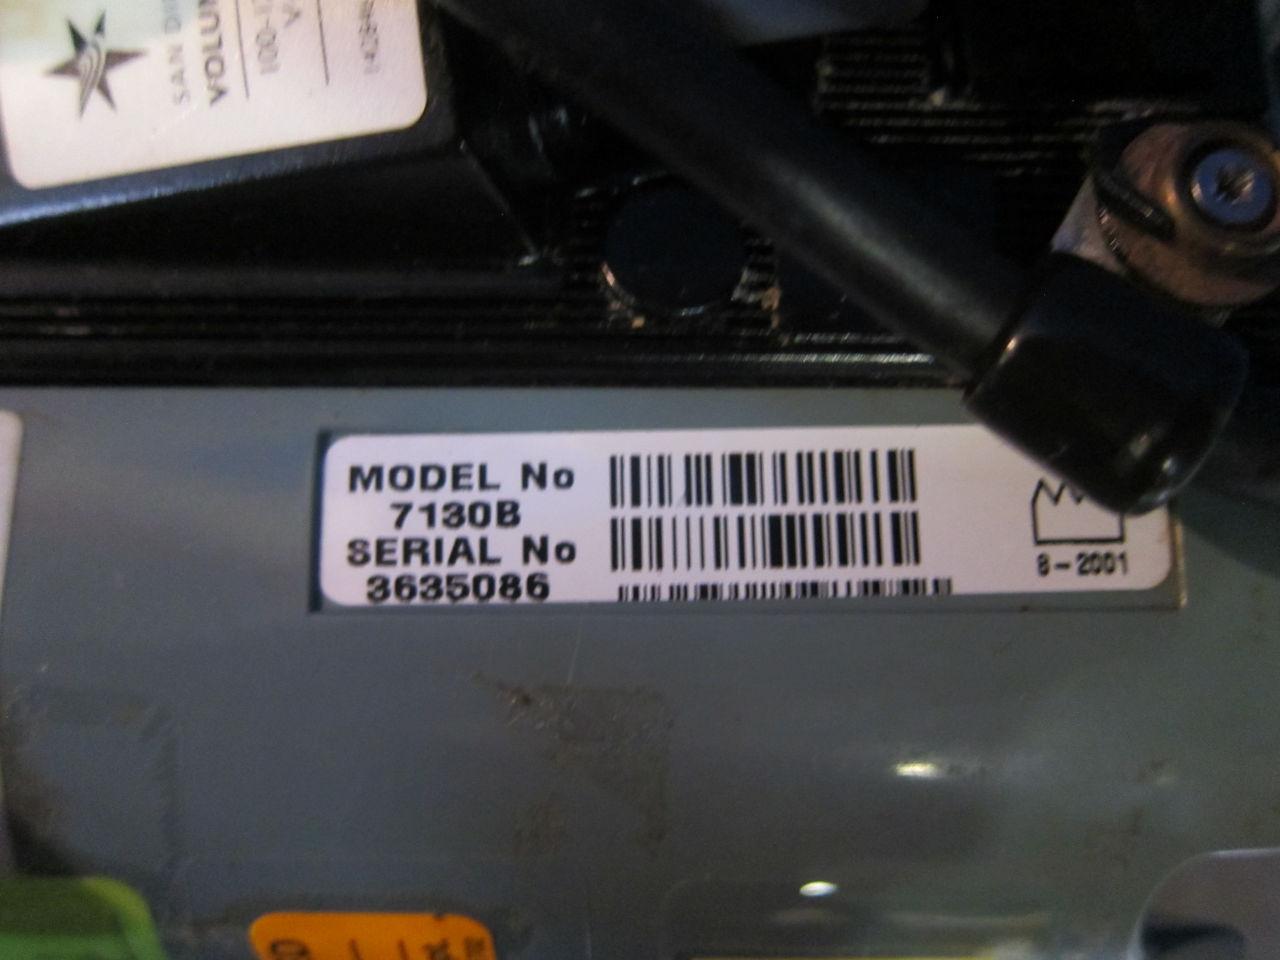 ALARIS 7130B  - Lot of 5 Pump IV Infusion